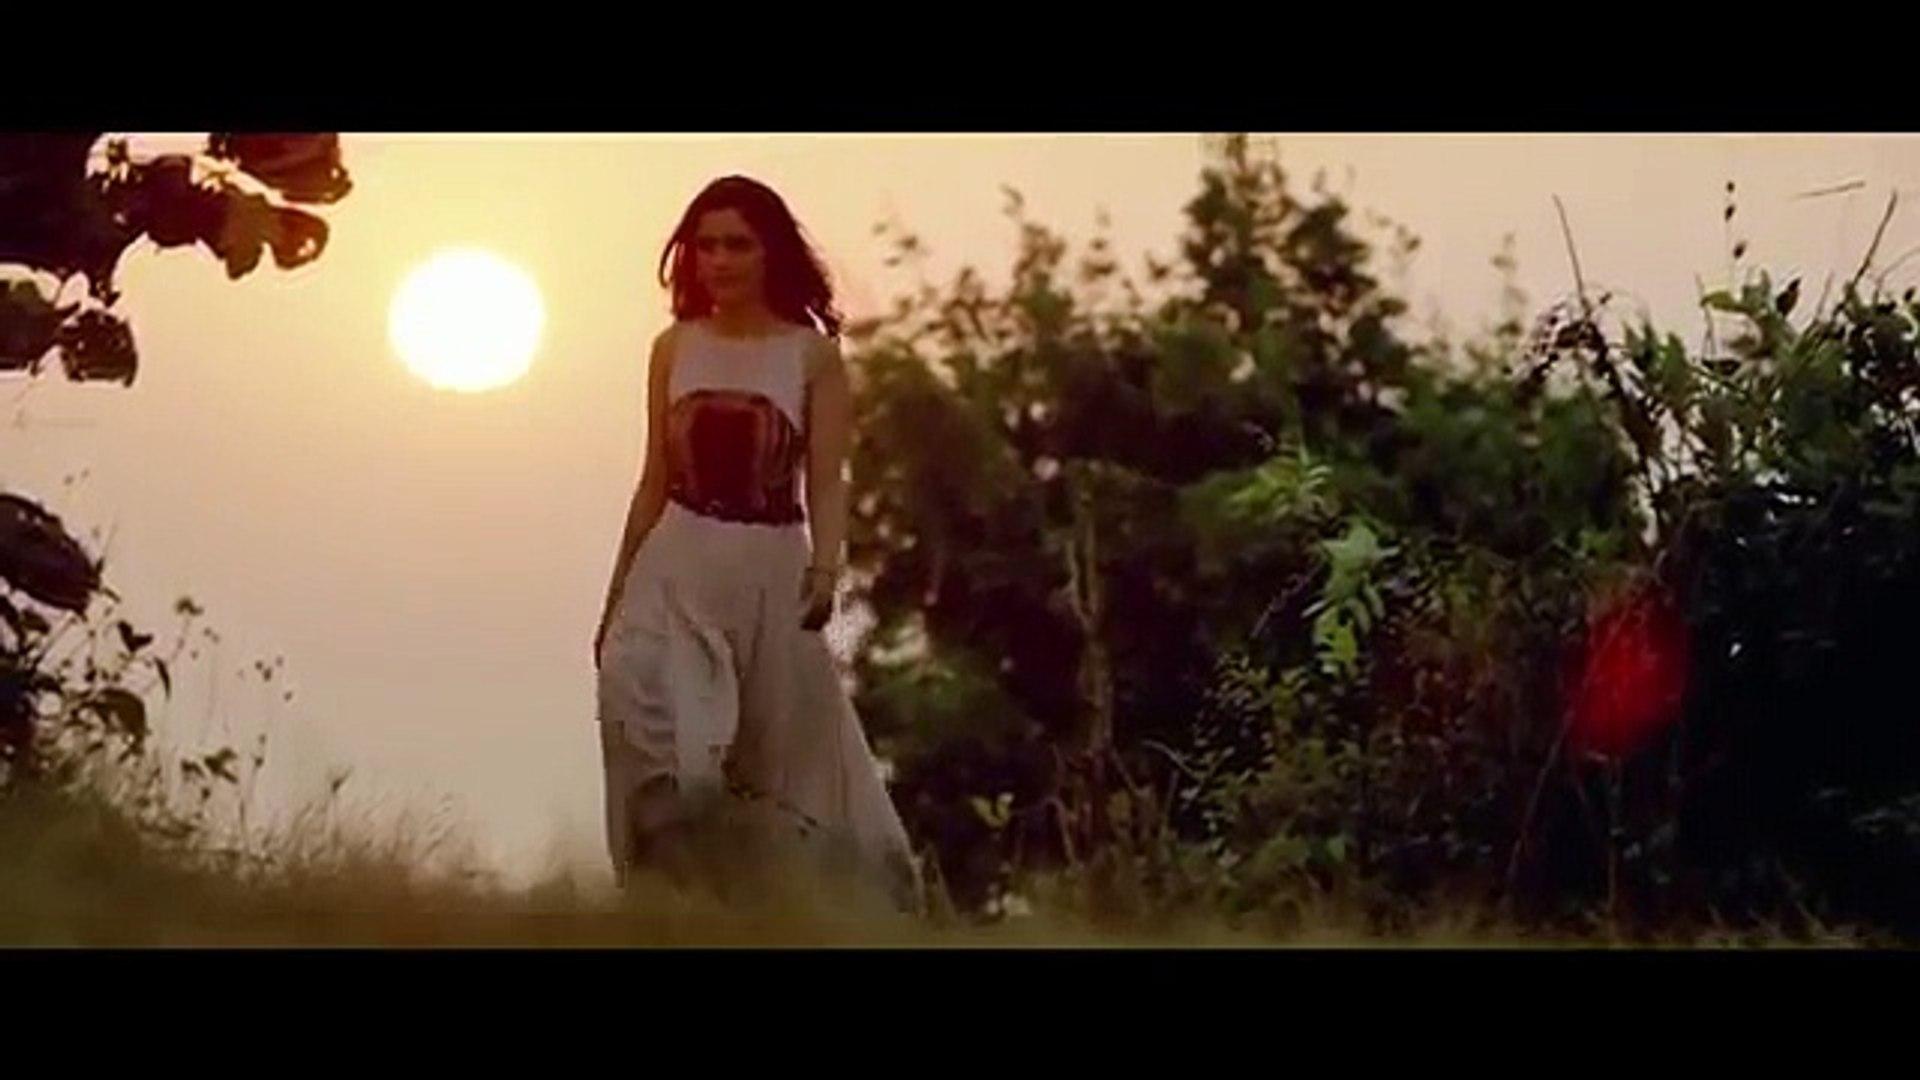 MA pass  trailer movie 2017 HD Latest Hindi Movie New Upcoming Bollywood Movie